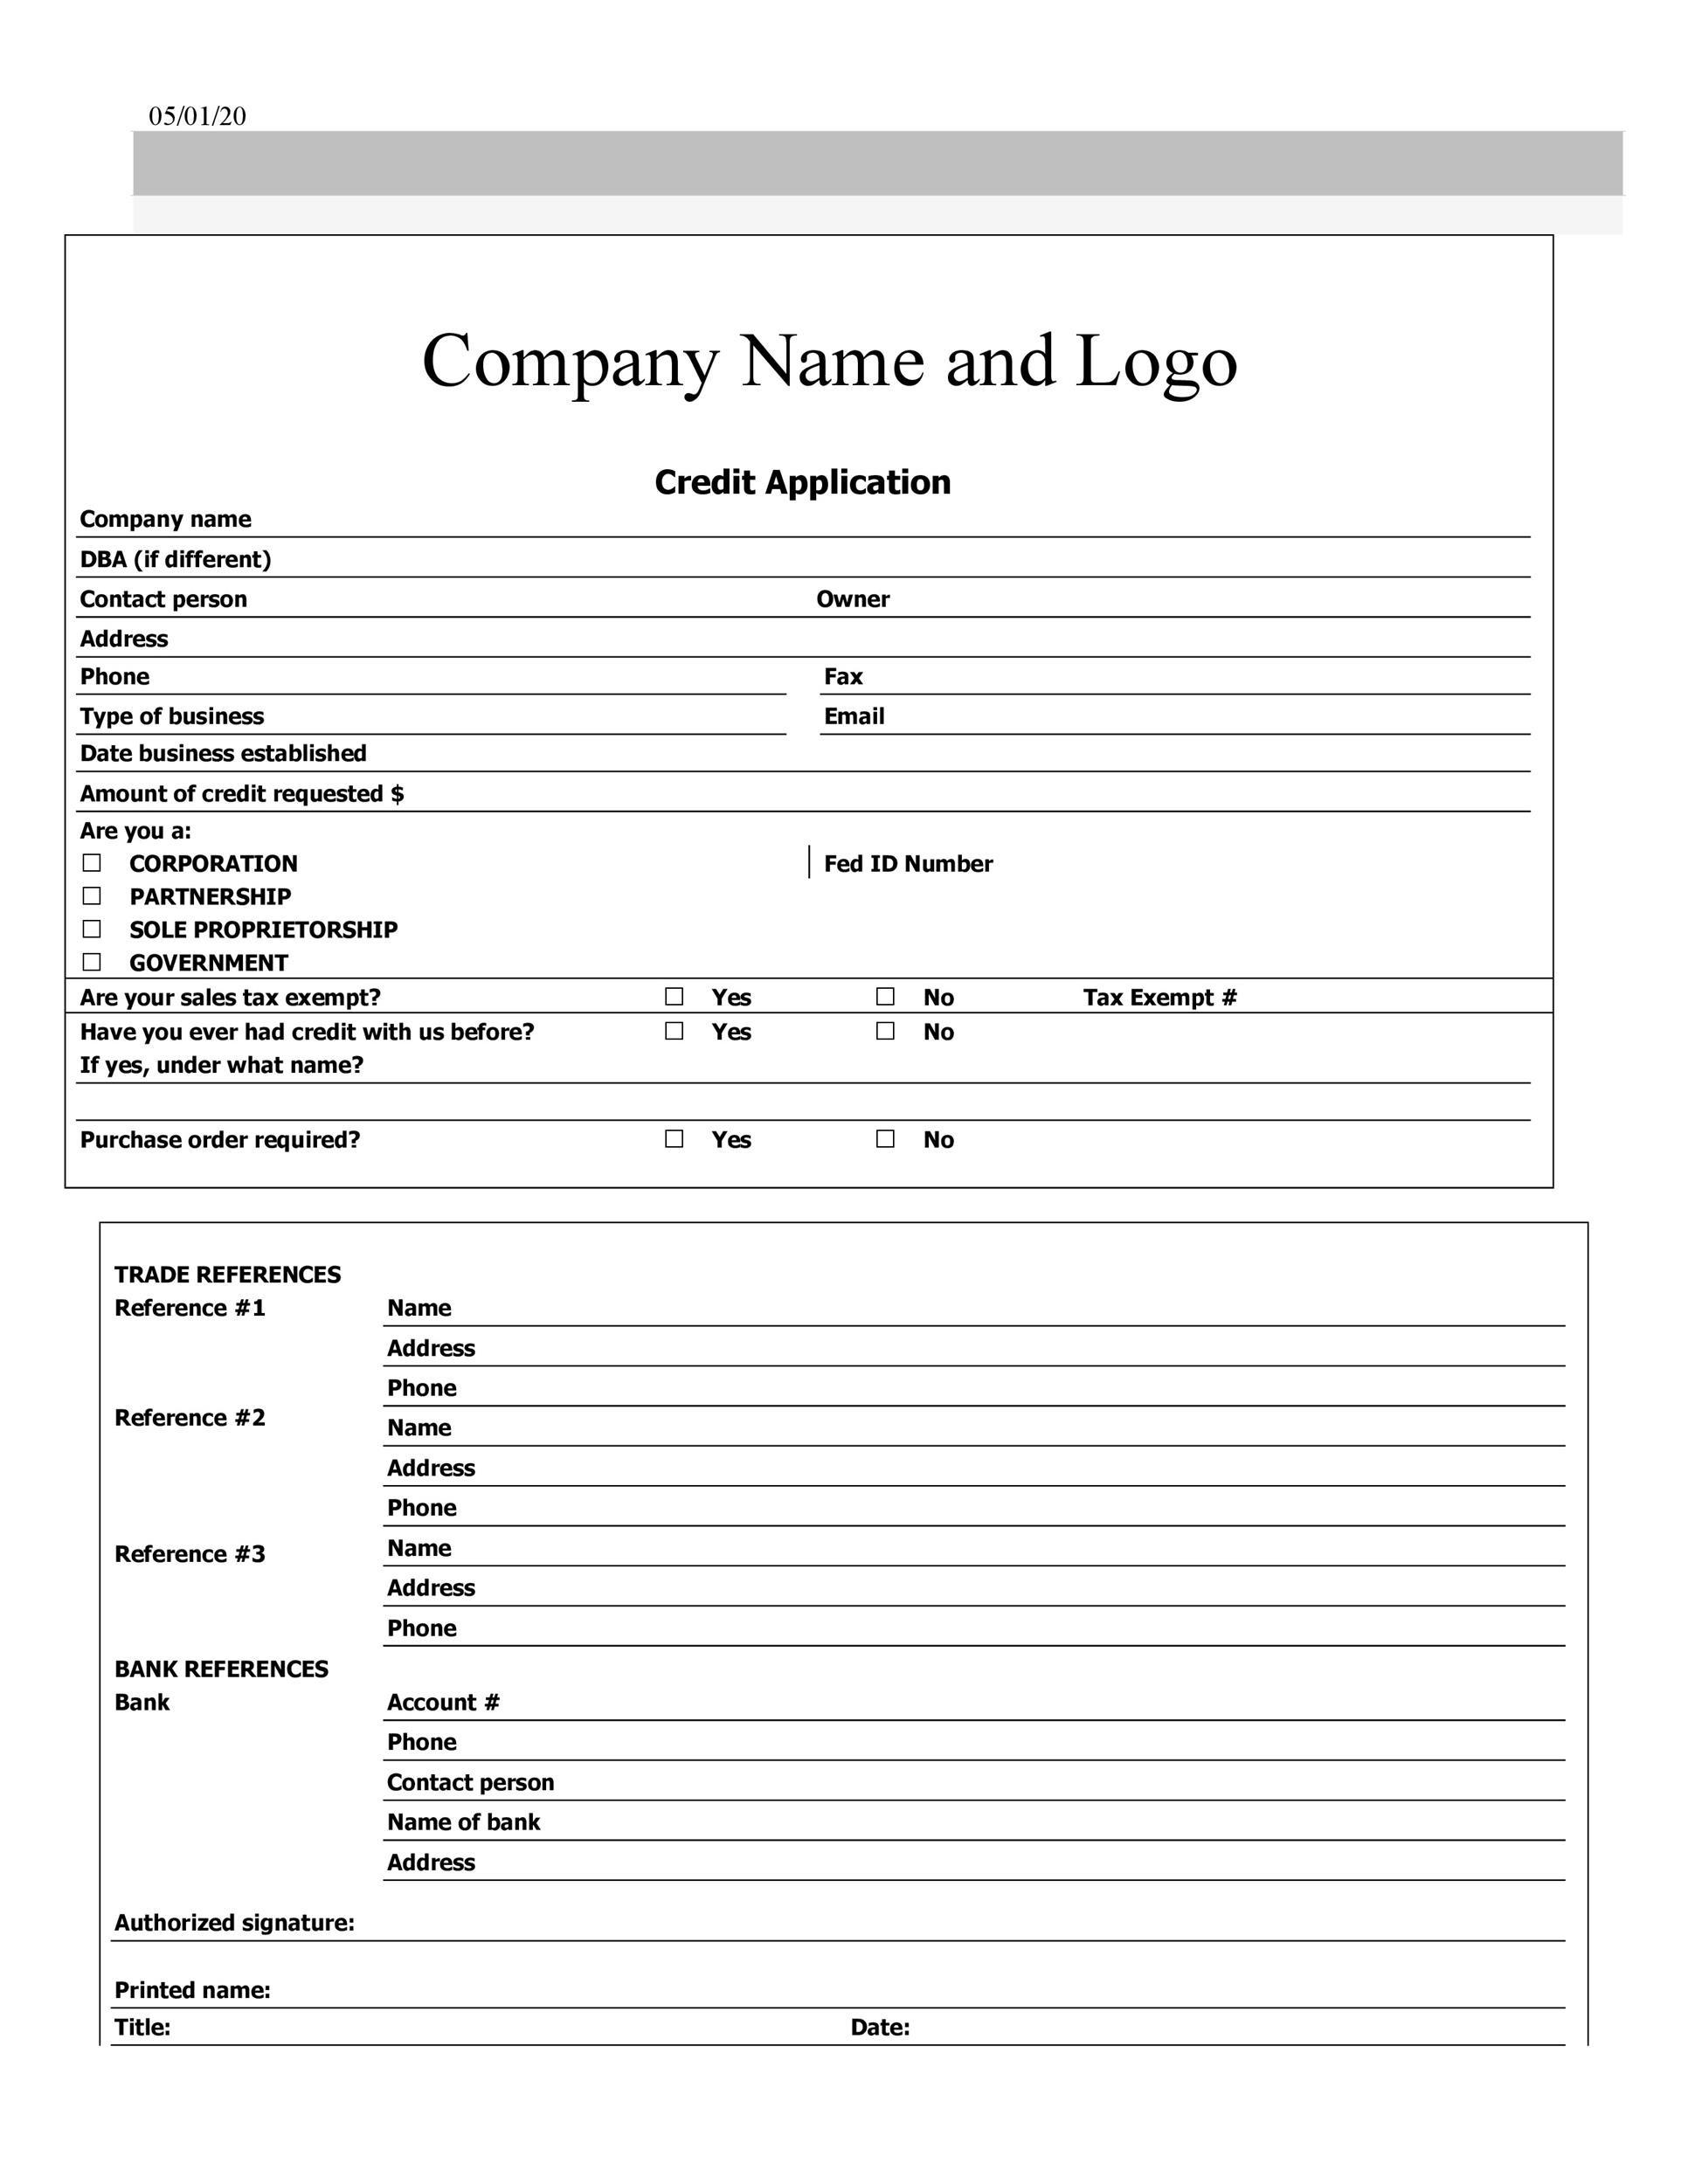 Free Credit Application Form 34